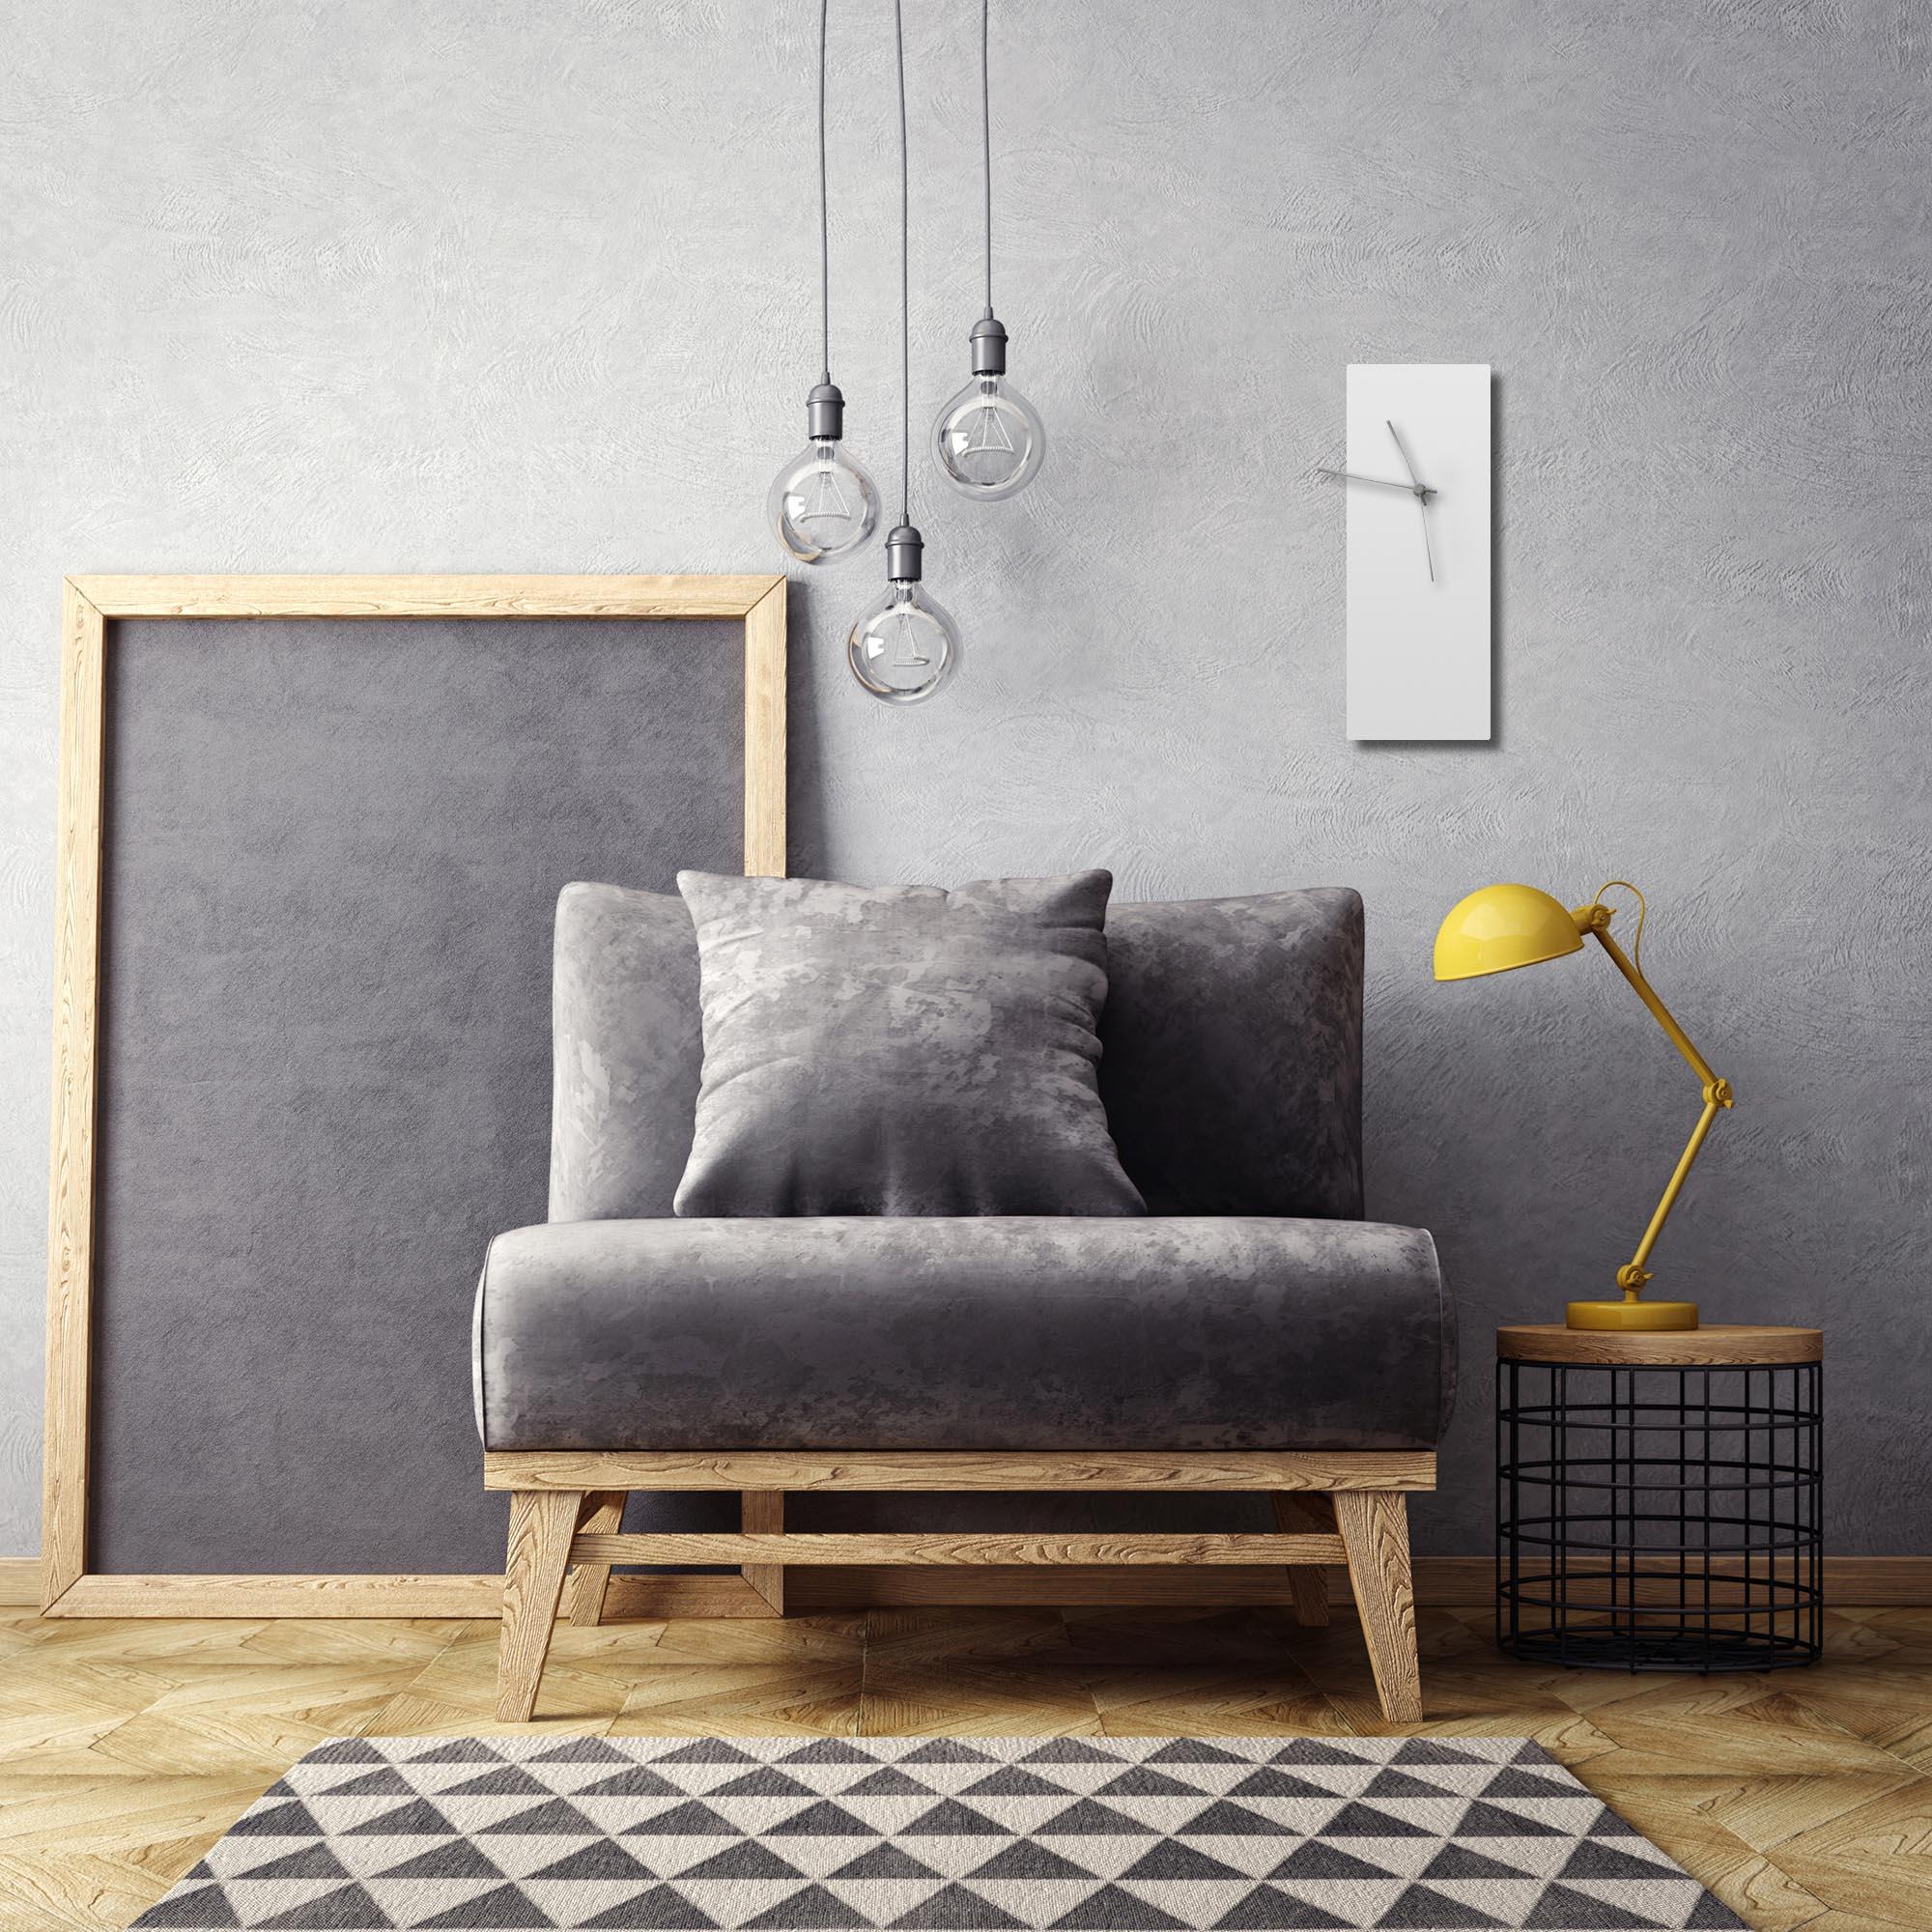 Whiteout Silver Clock - Lifestyle View